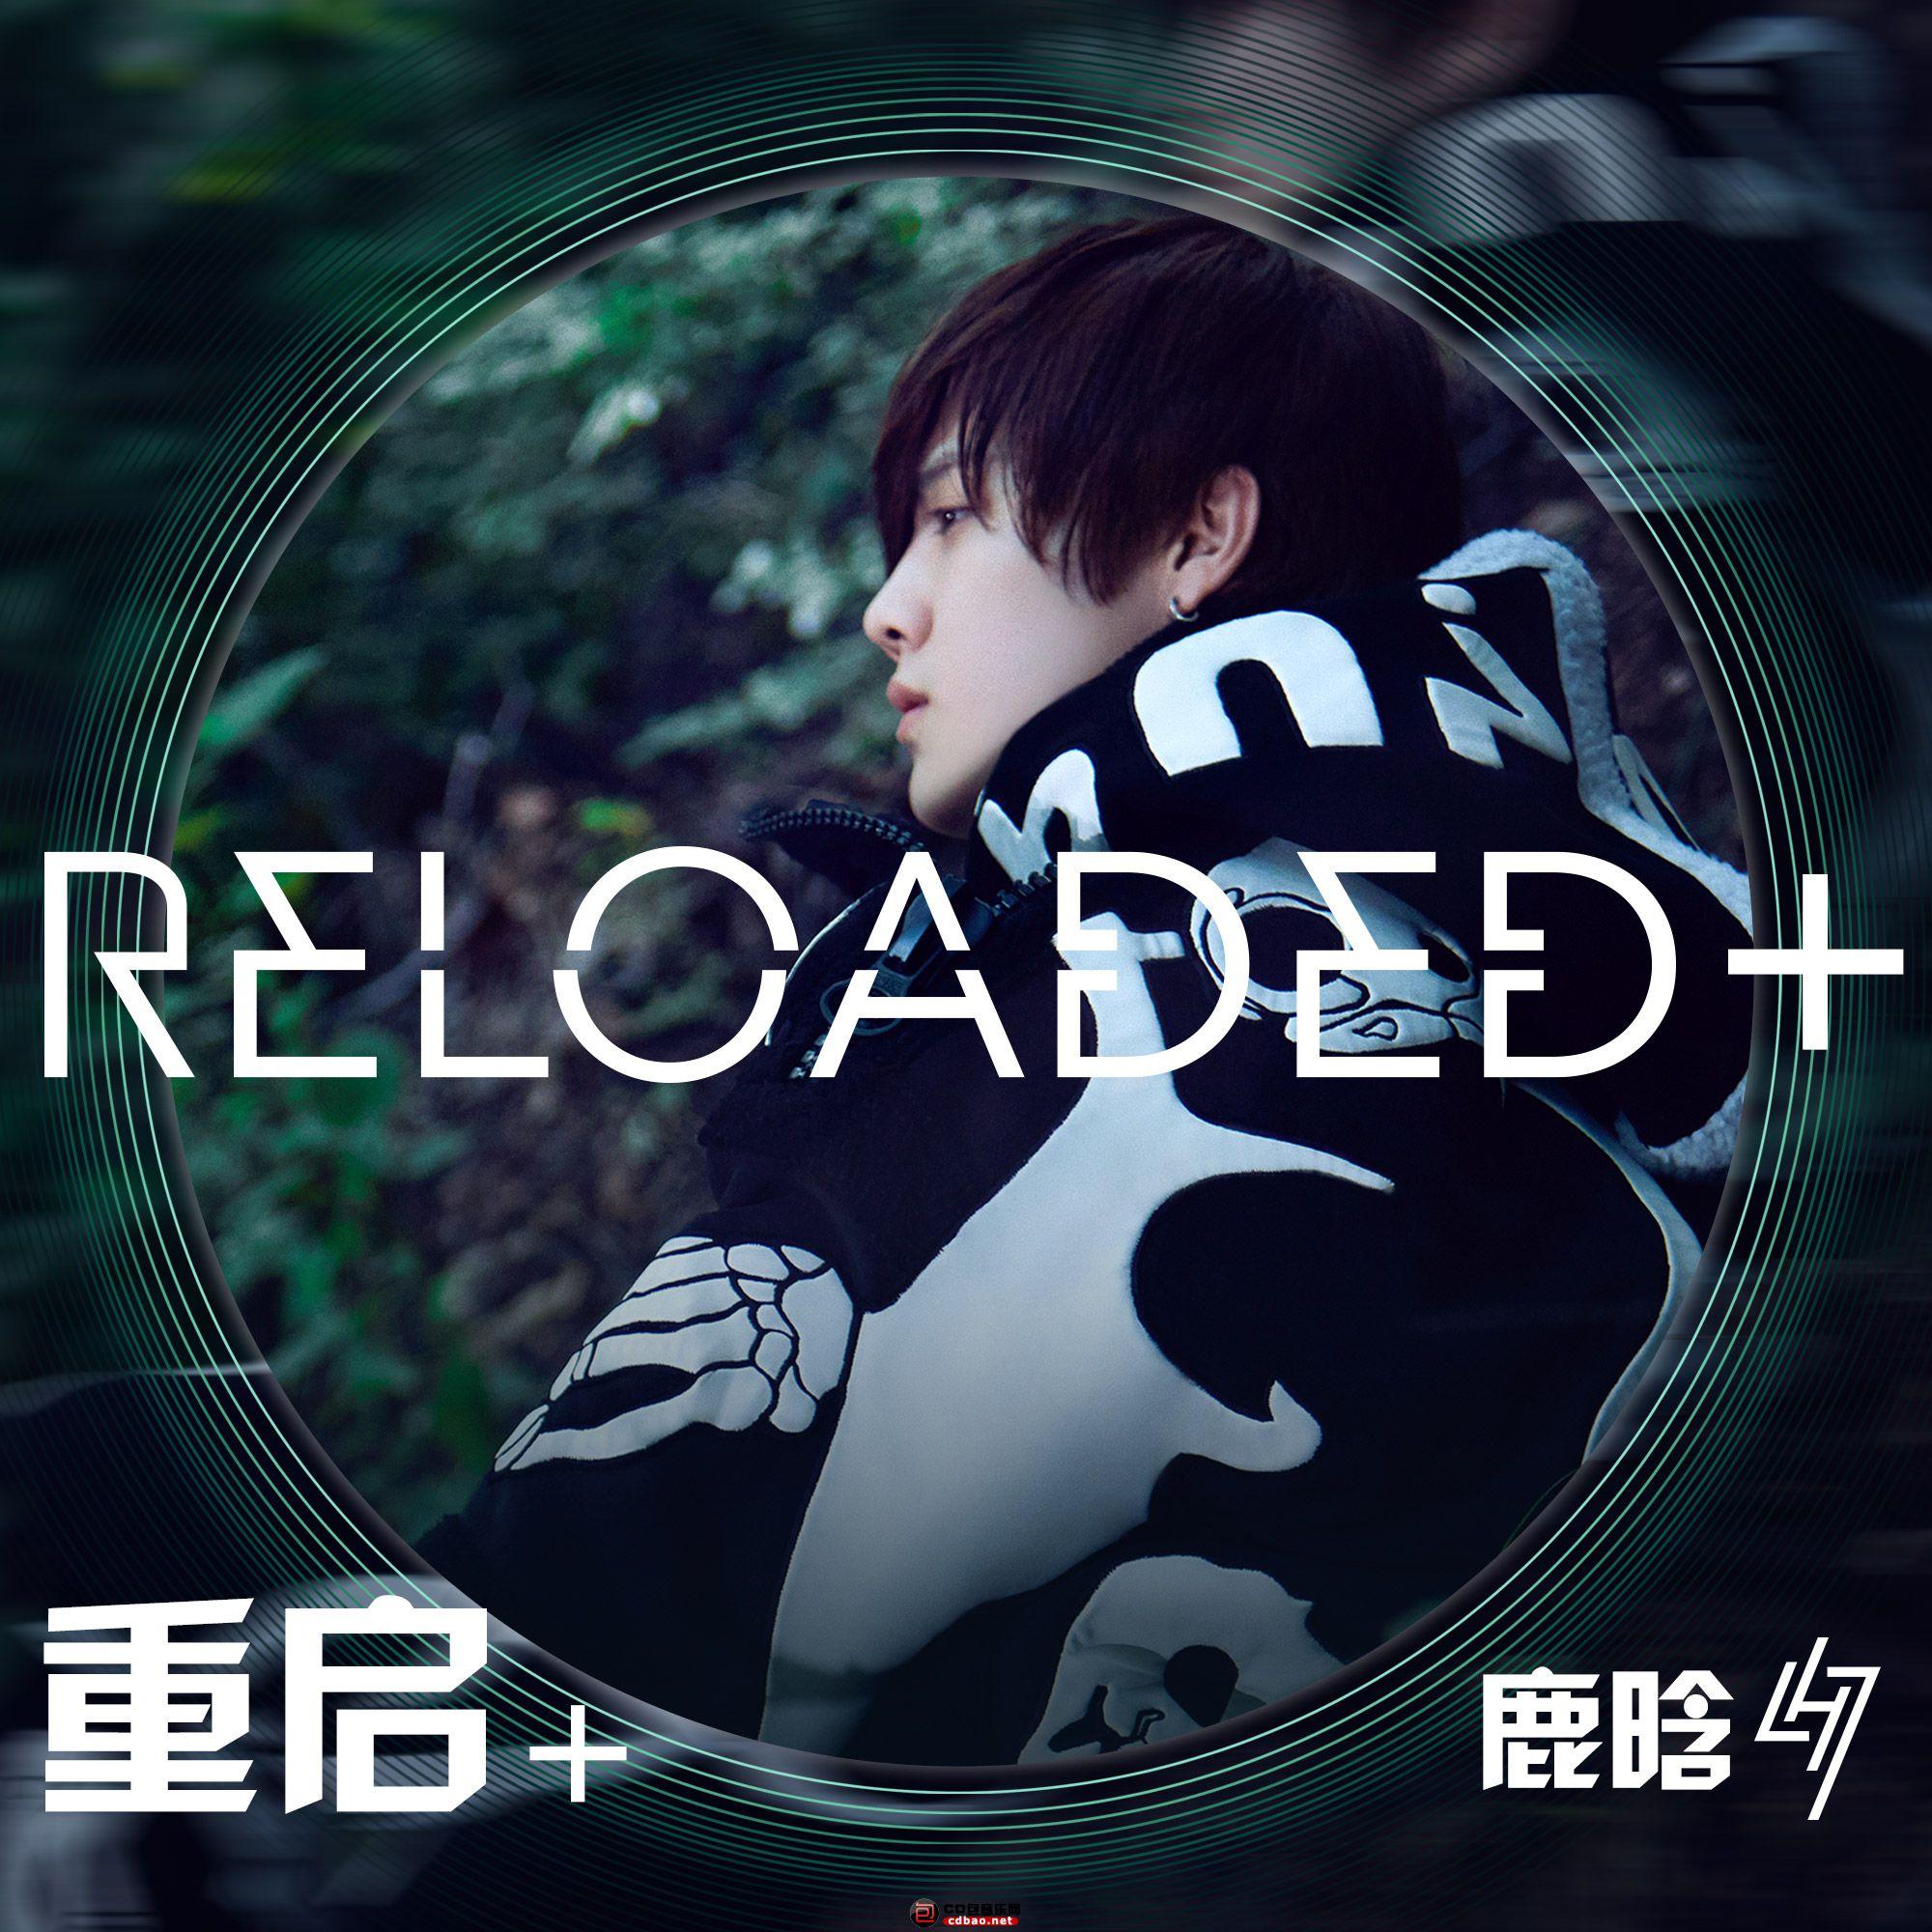 鹿晗《Reloaded  (重启  )》海报.jpg